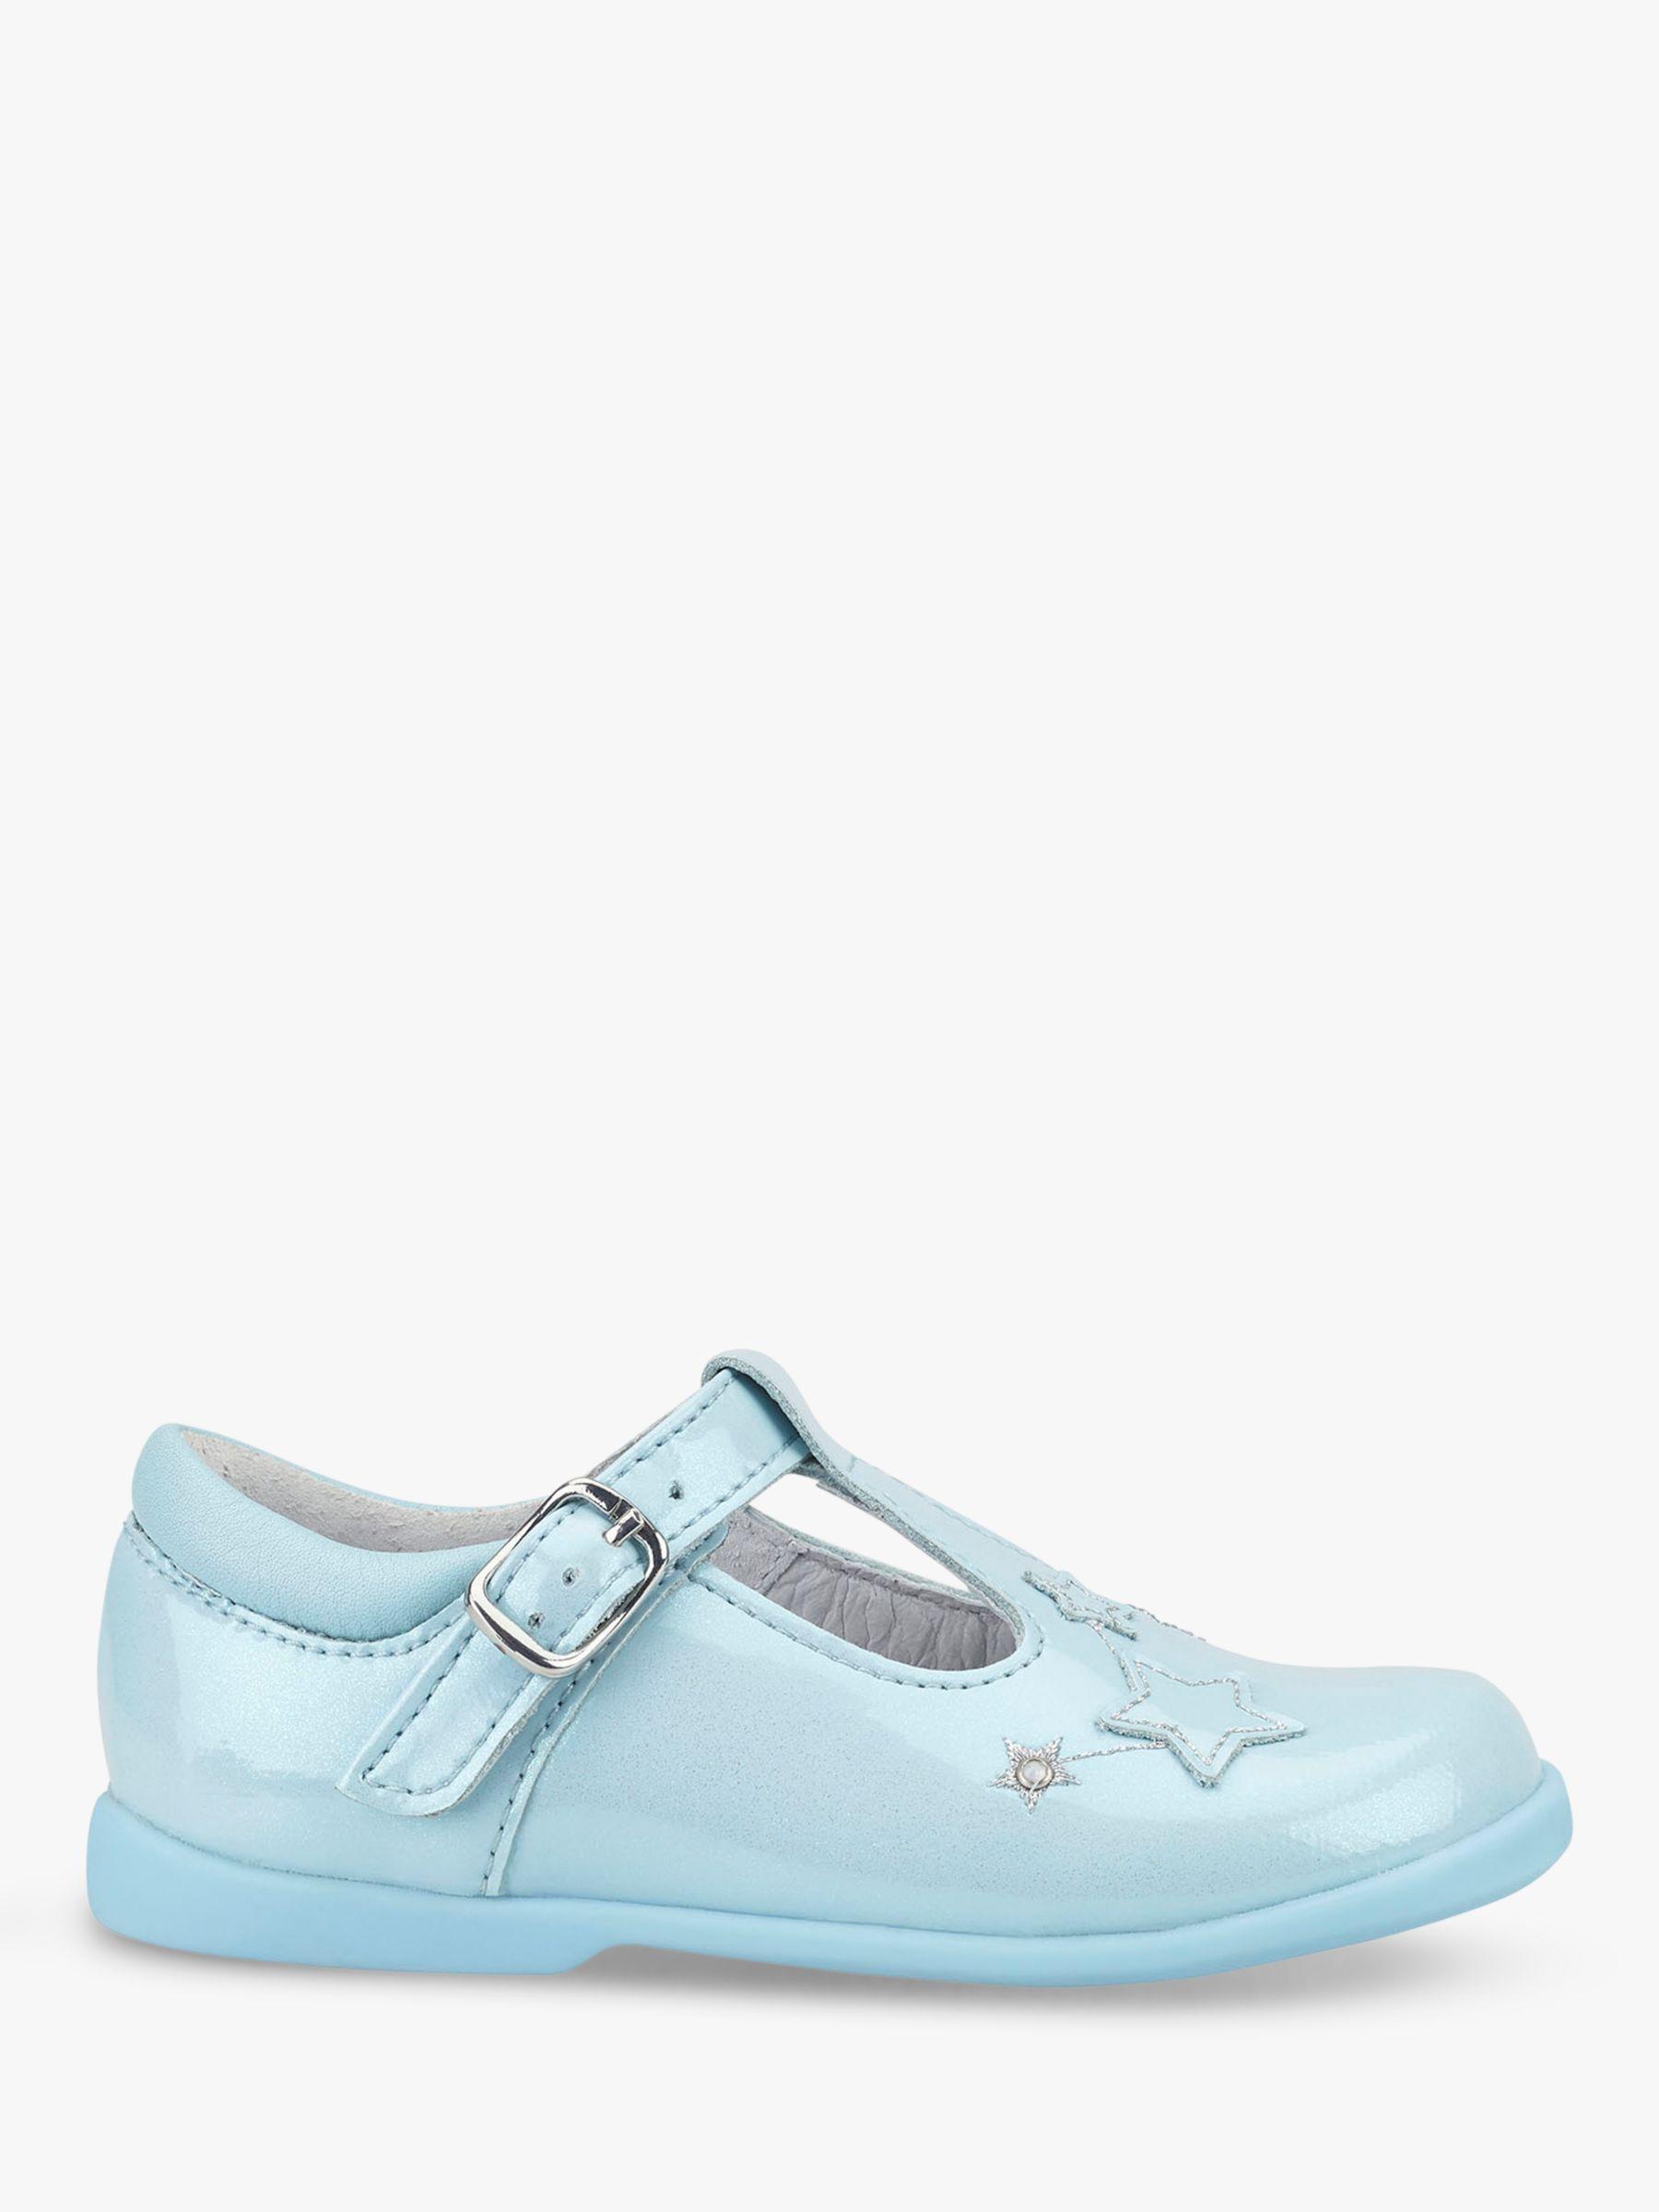 Start-Rite Start-rite Children's Star Gaze T-Bar Shoes, Blue Glitter Patent